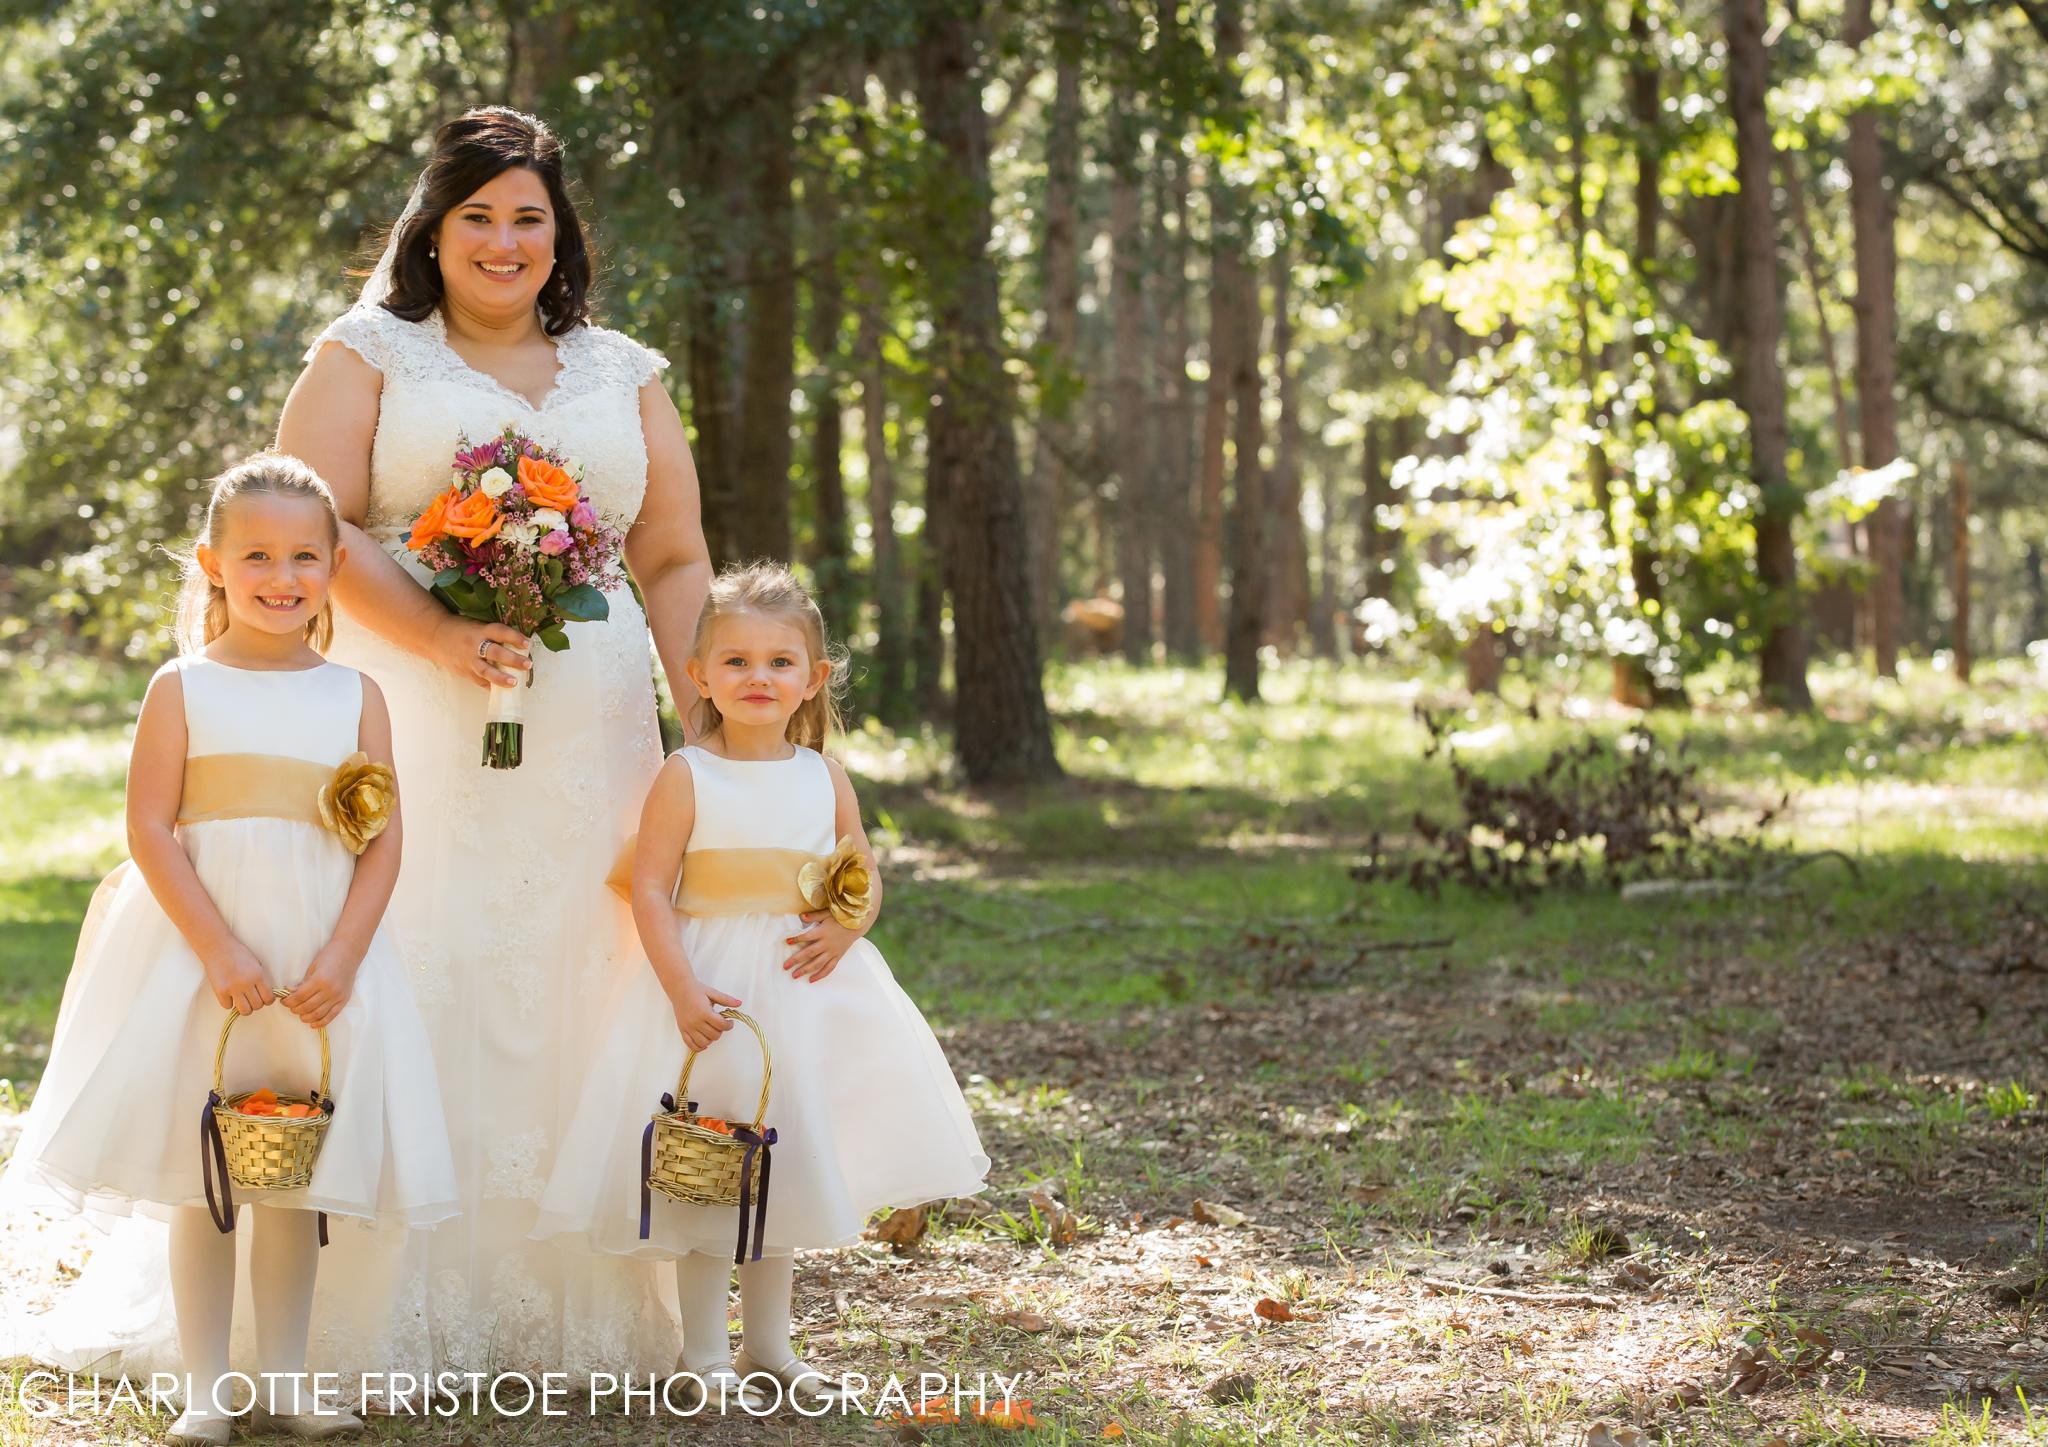 Lake Iamonia Wedding Charlotte Fristoe Photography-20.jpg